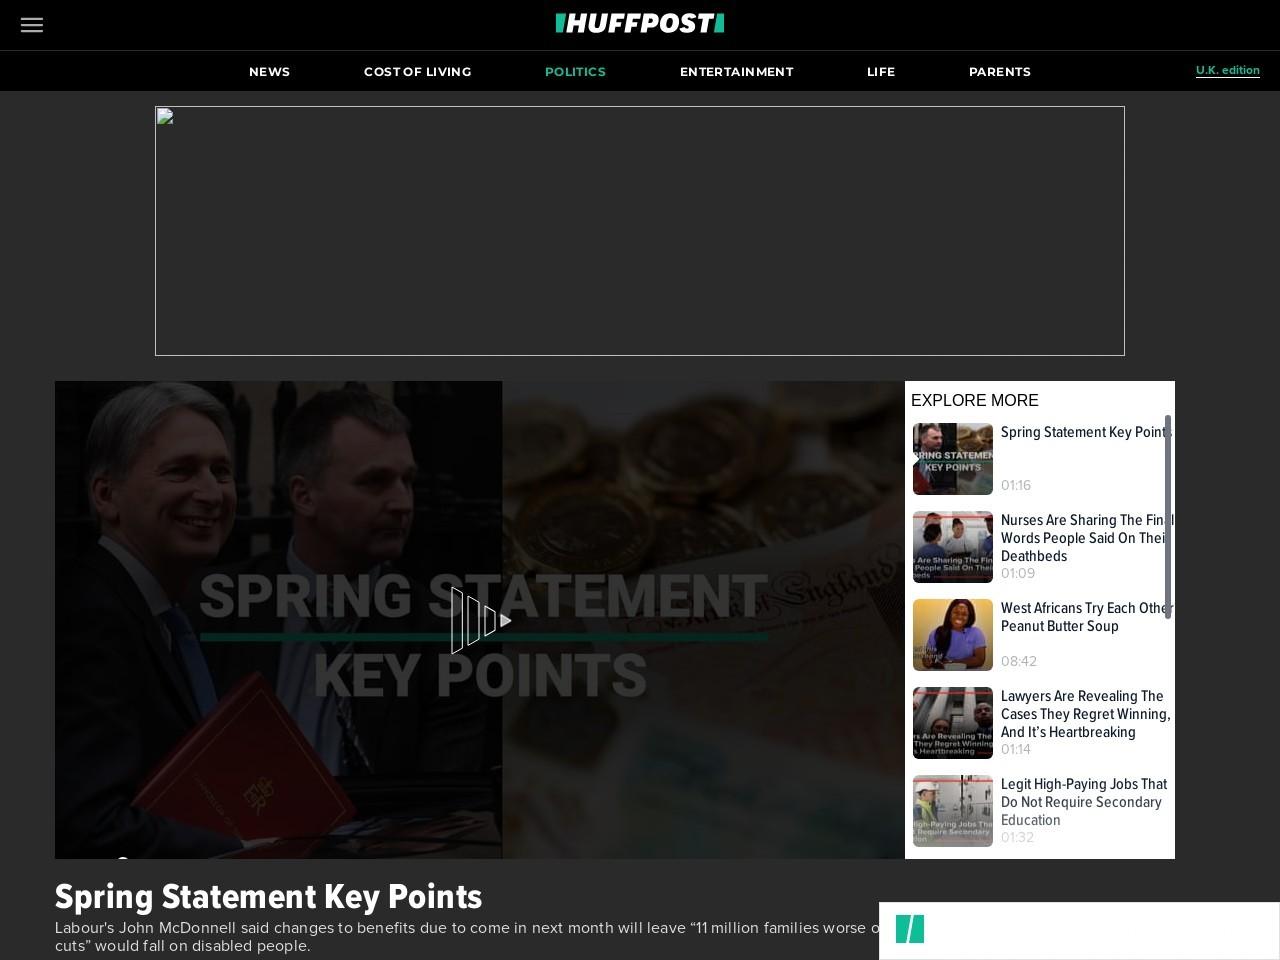 Spring Statement Key Points